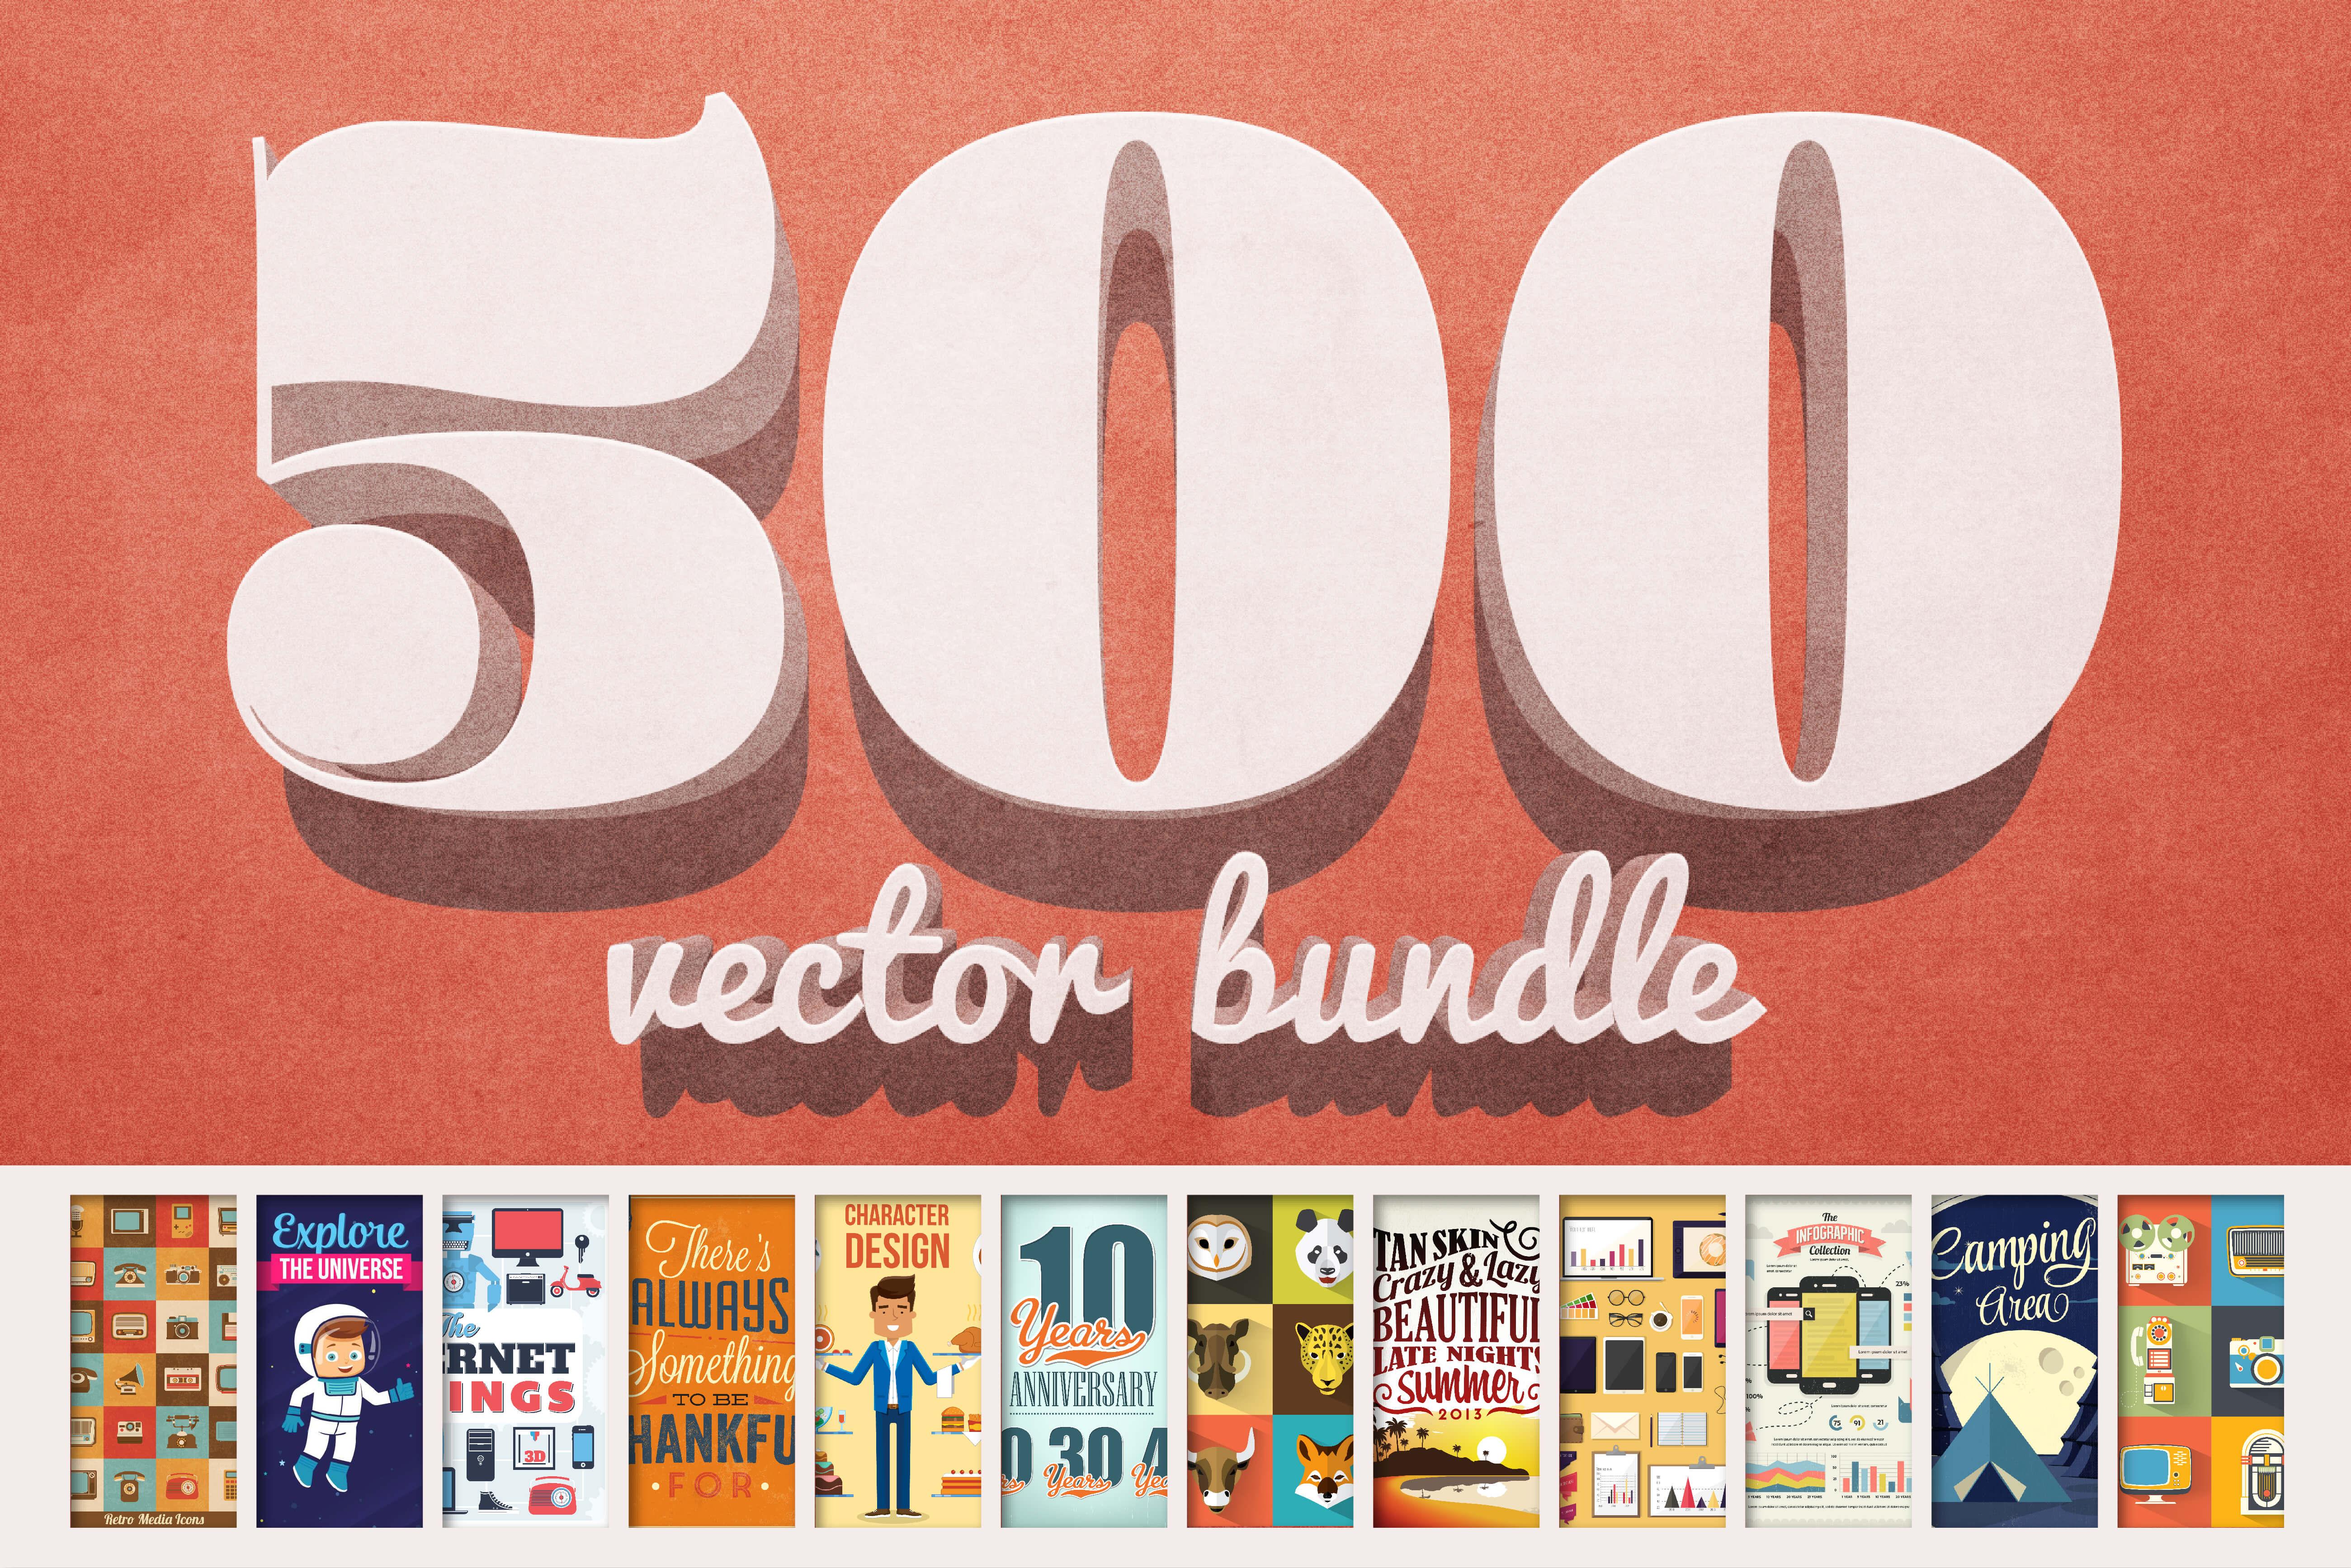 Vectorlicious Bundle: $2,500 Worth of Premium Quality Vectors – only $24!